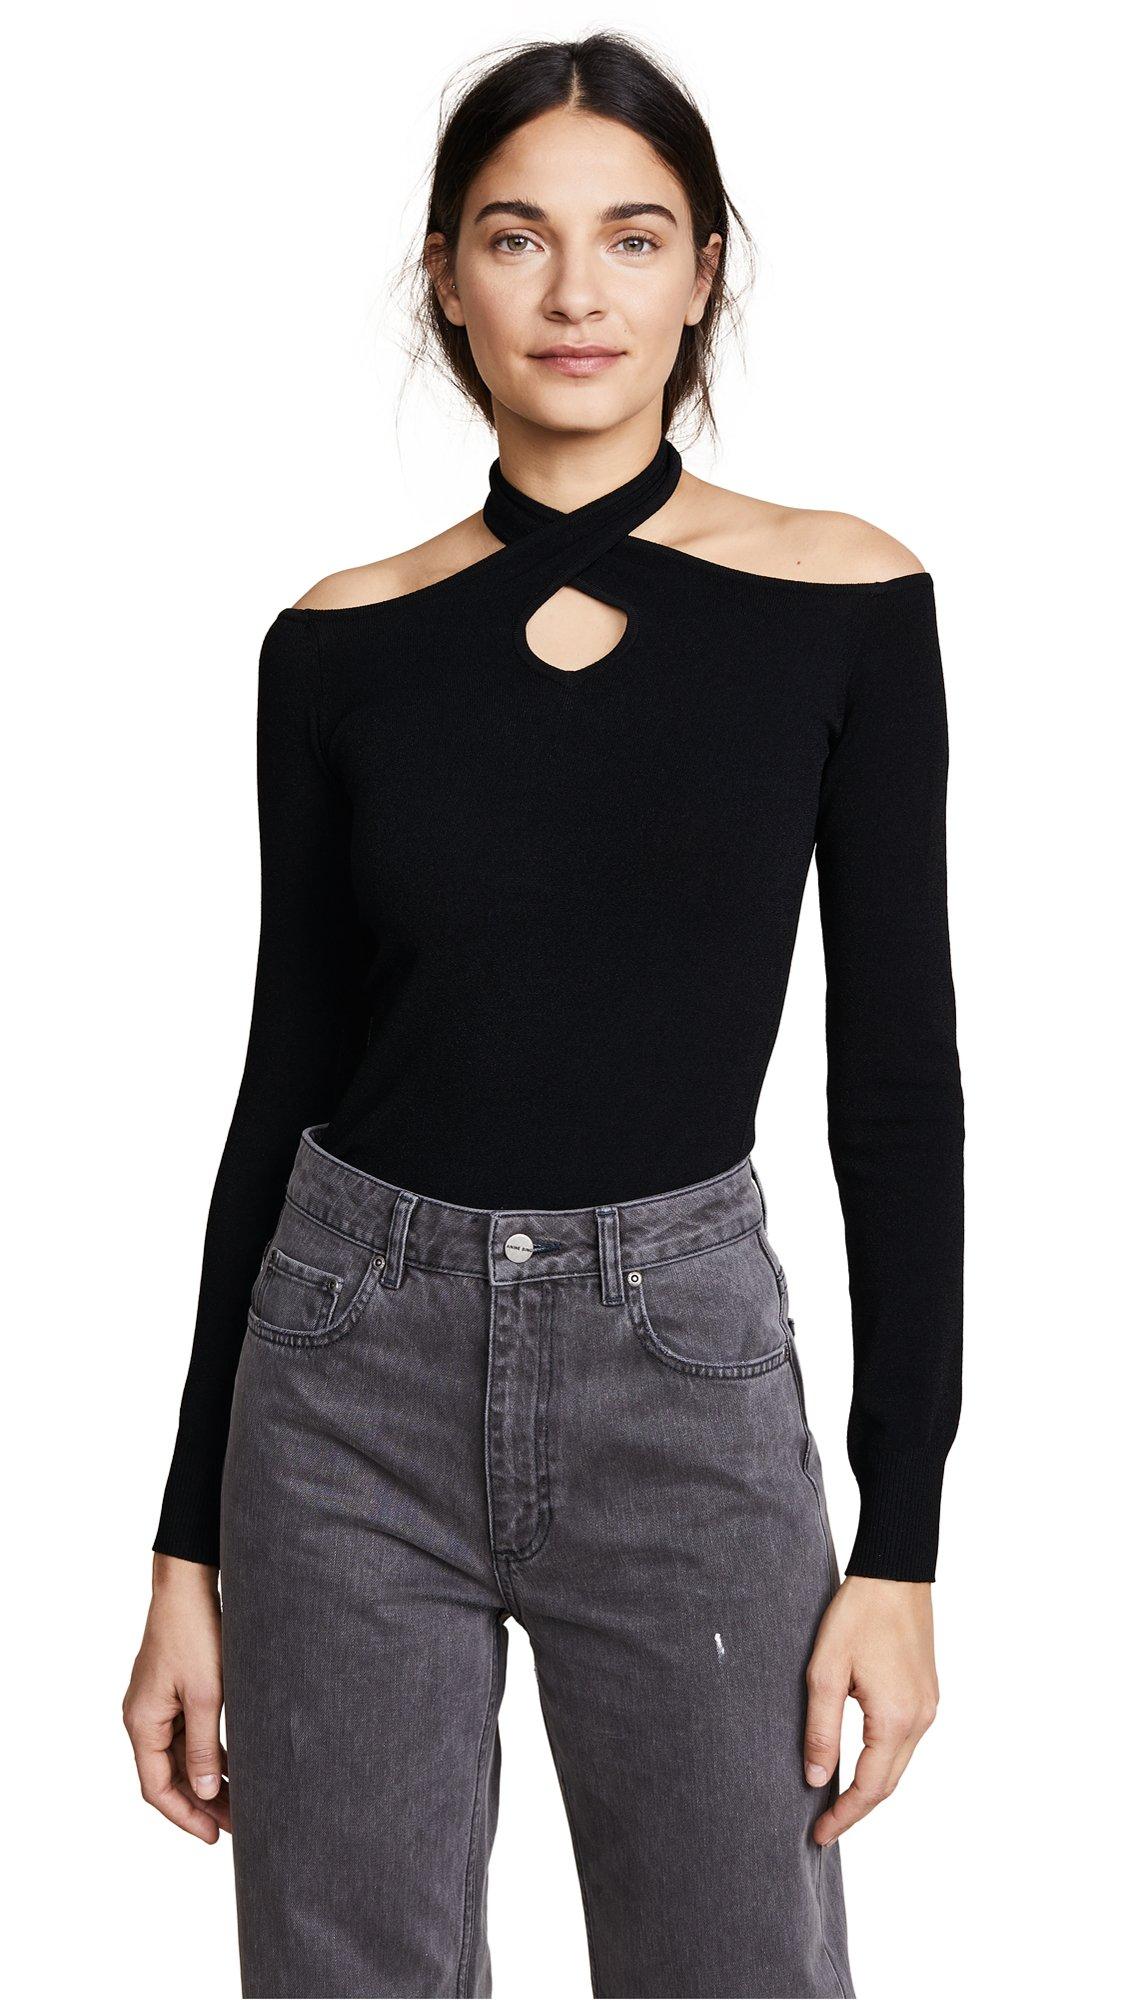 Autumn Cashmere Women's Cold Shoulder Halter Neck Sweater, Black, Medium